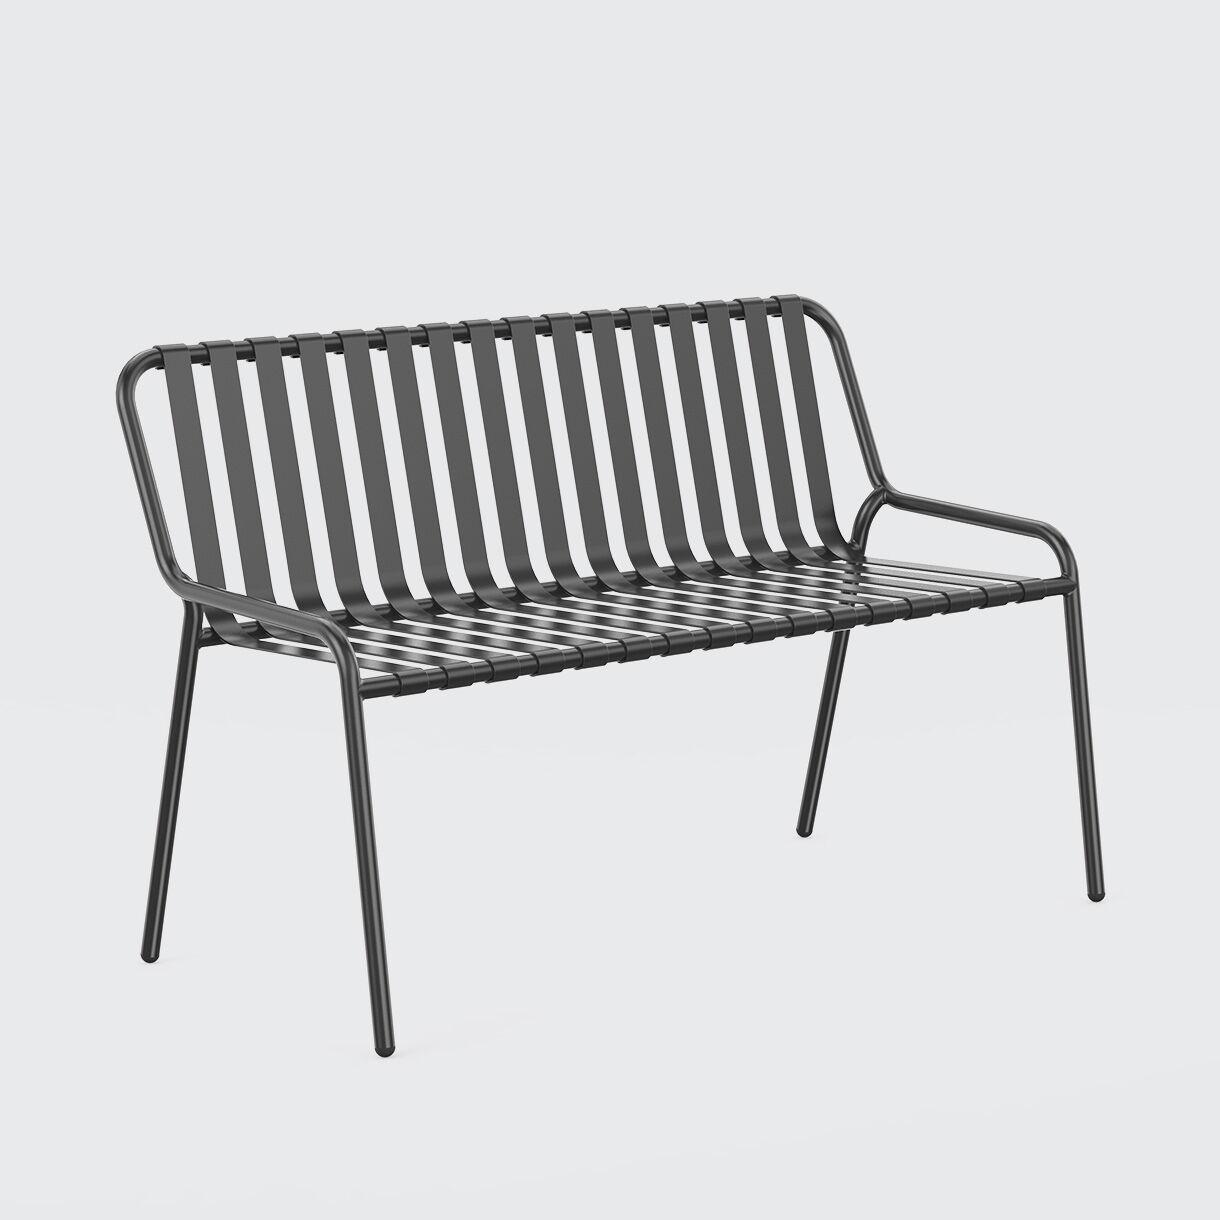 Strap 2 Seater Chair, Black